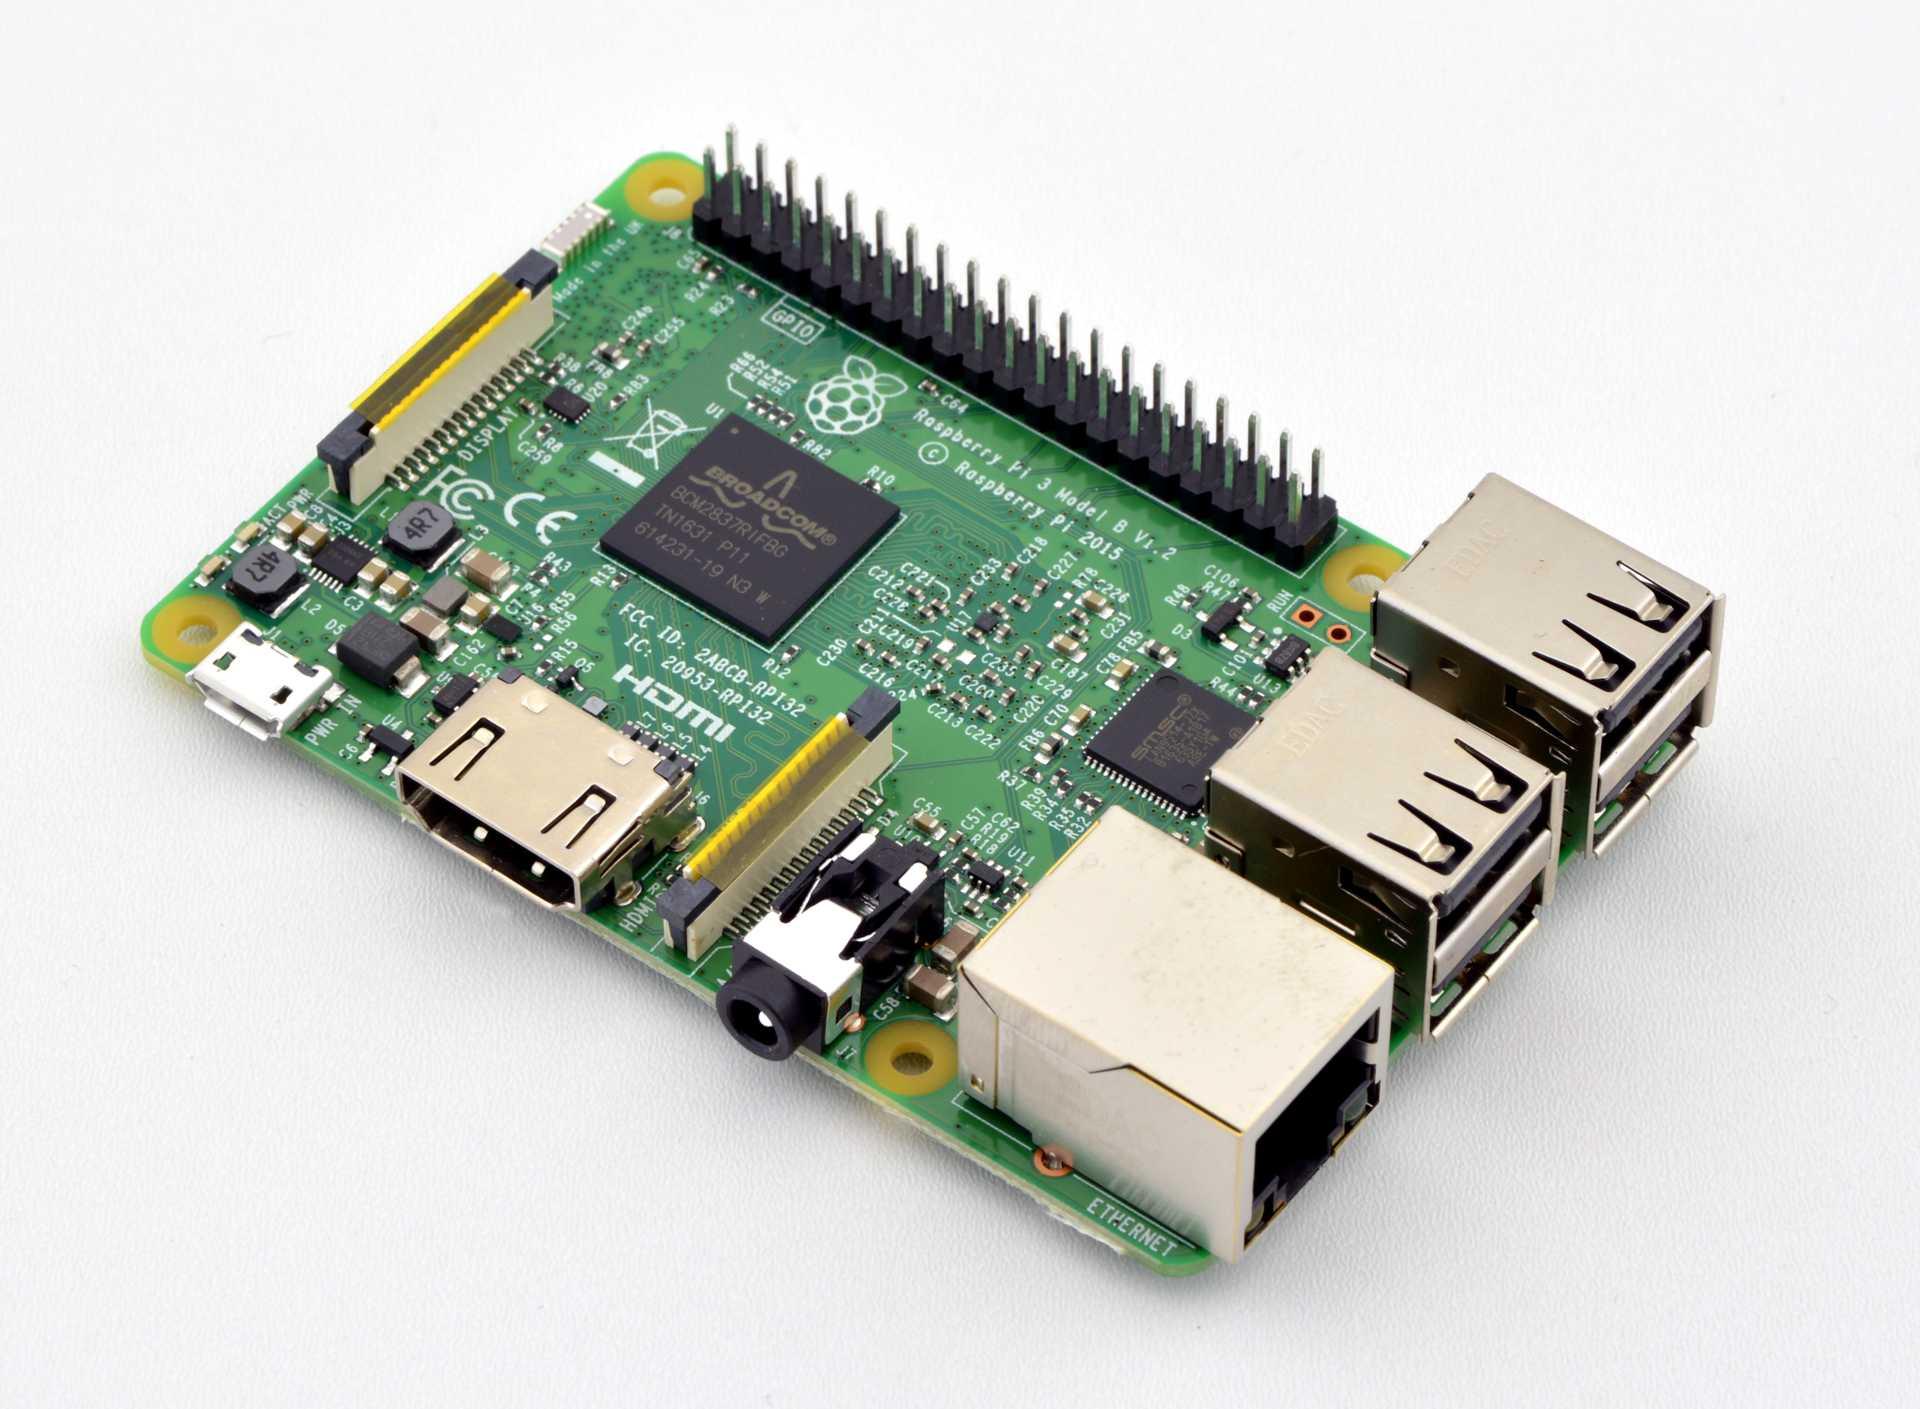 RaspberryPi 3 - Mini-Computer